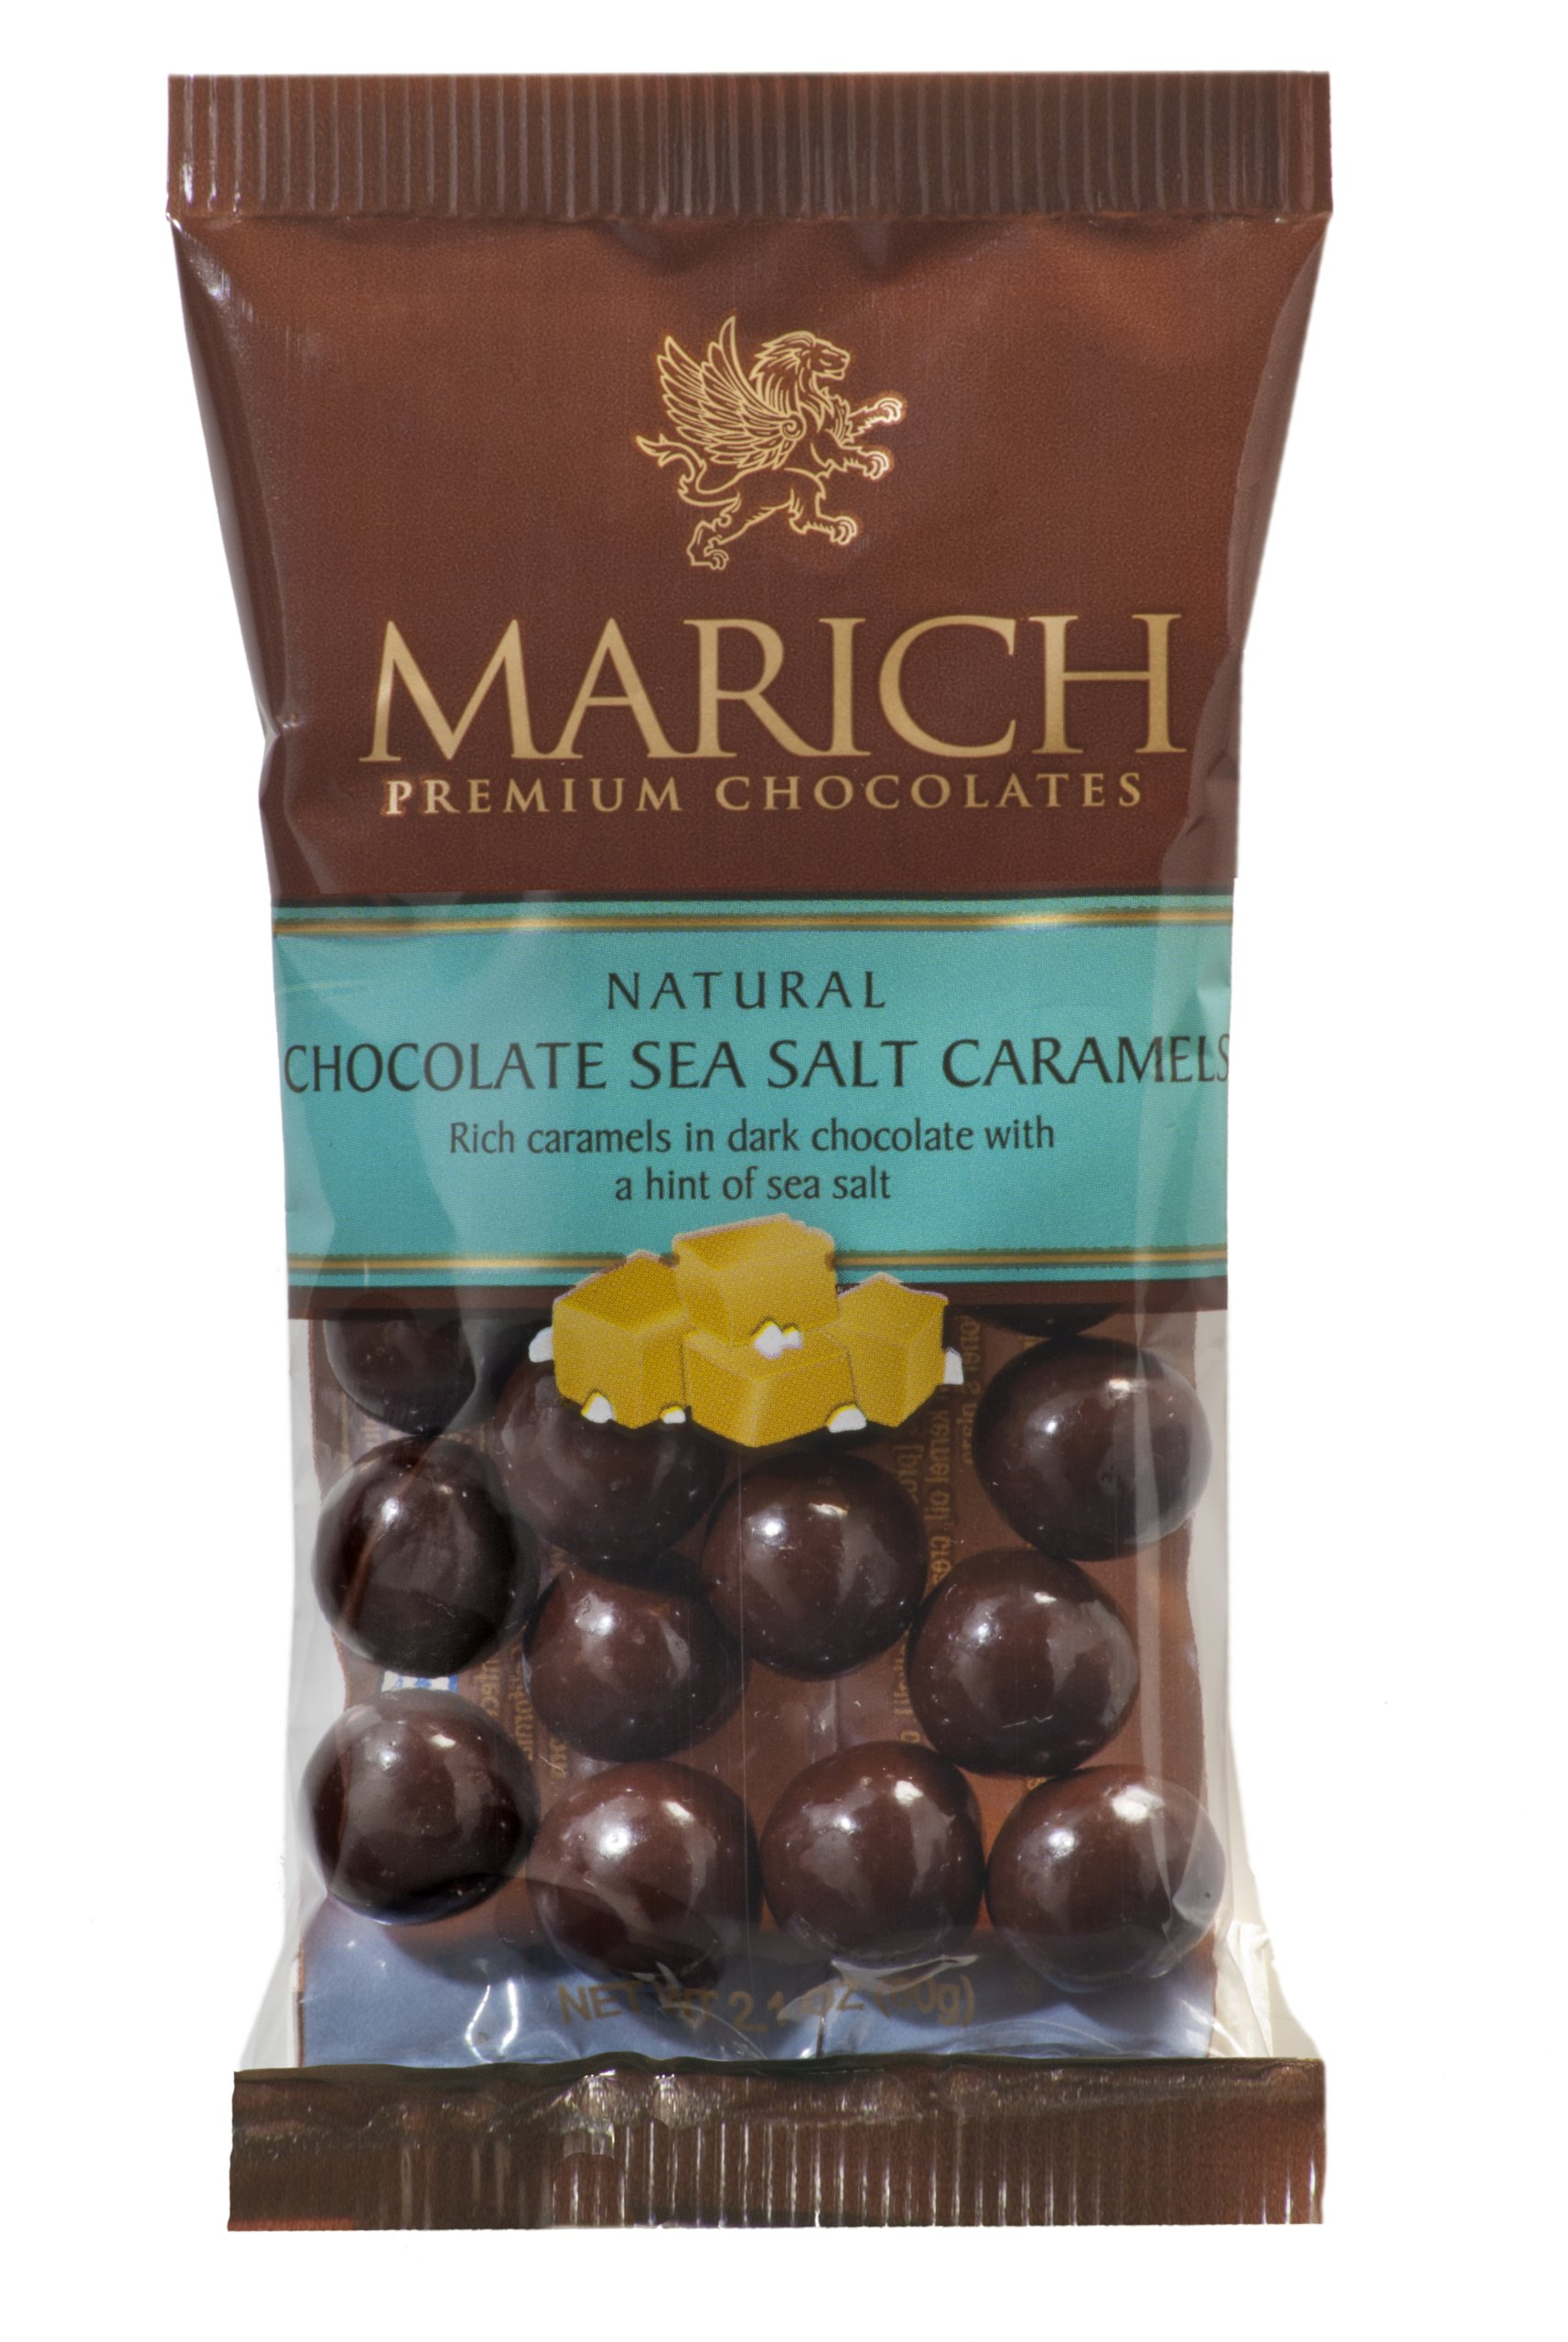 Marich Dark Choc Sea Salt Caramels, 2.1-Ounce (Pack of 12) by Marich